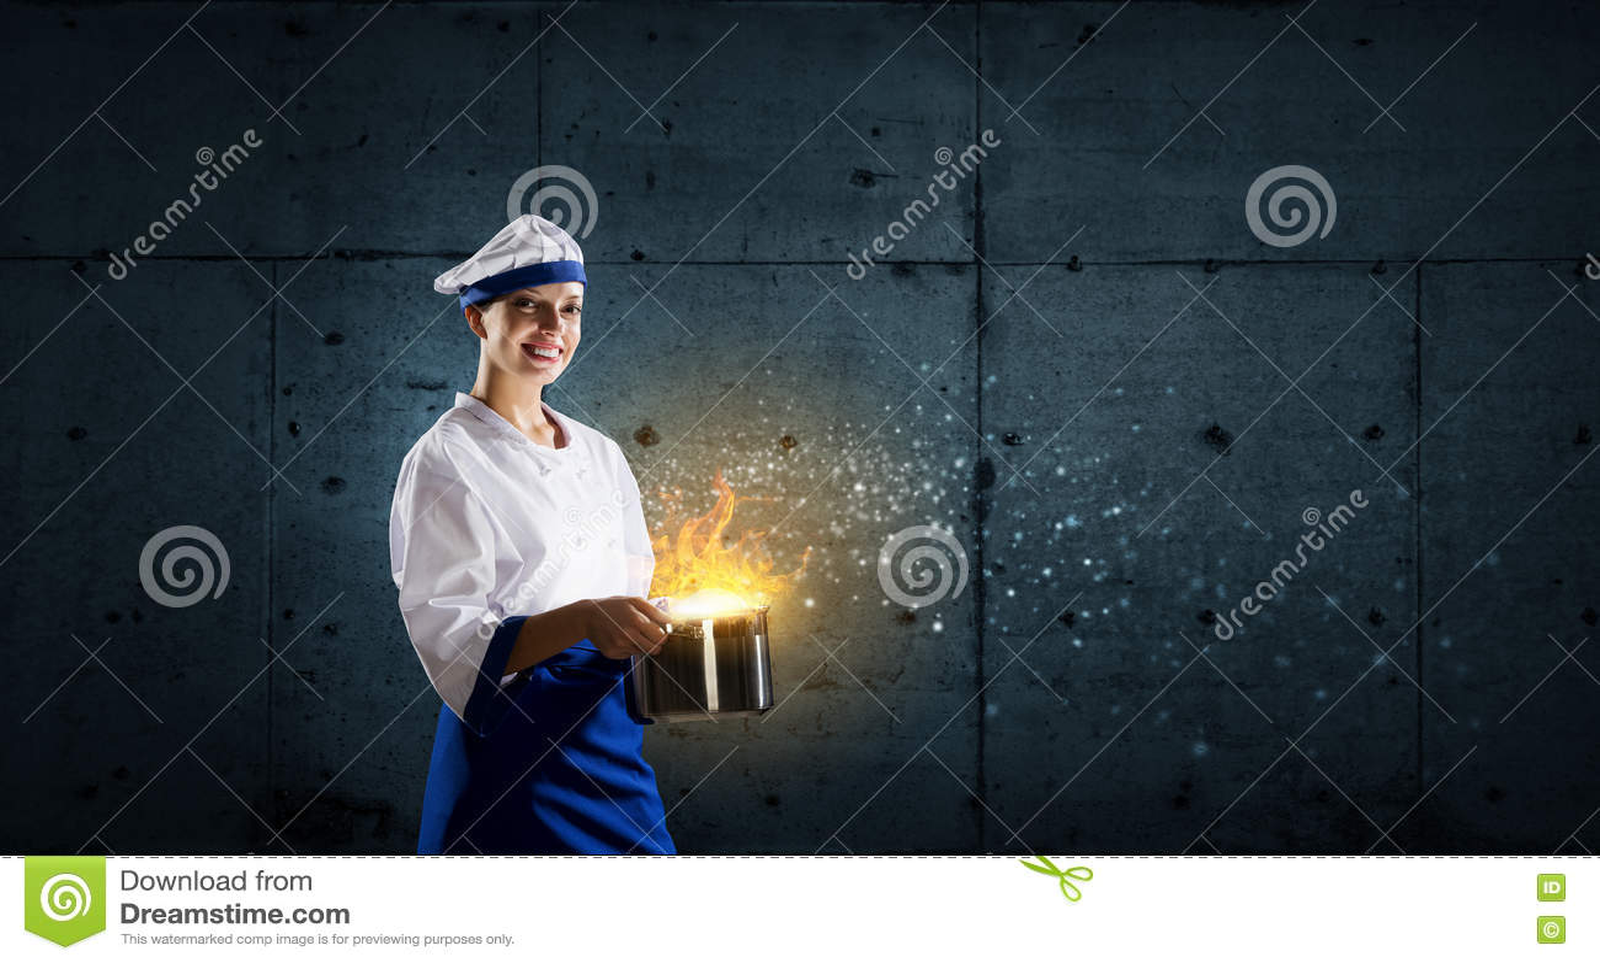 kitchen magician shelf for 她是魔术师作为厨师库存图片 图片包括有厨房 午餐 人员 快乐 烹调 她是魔术师作为厨师